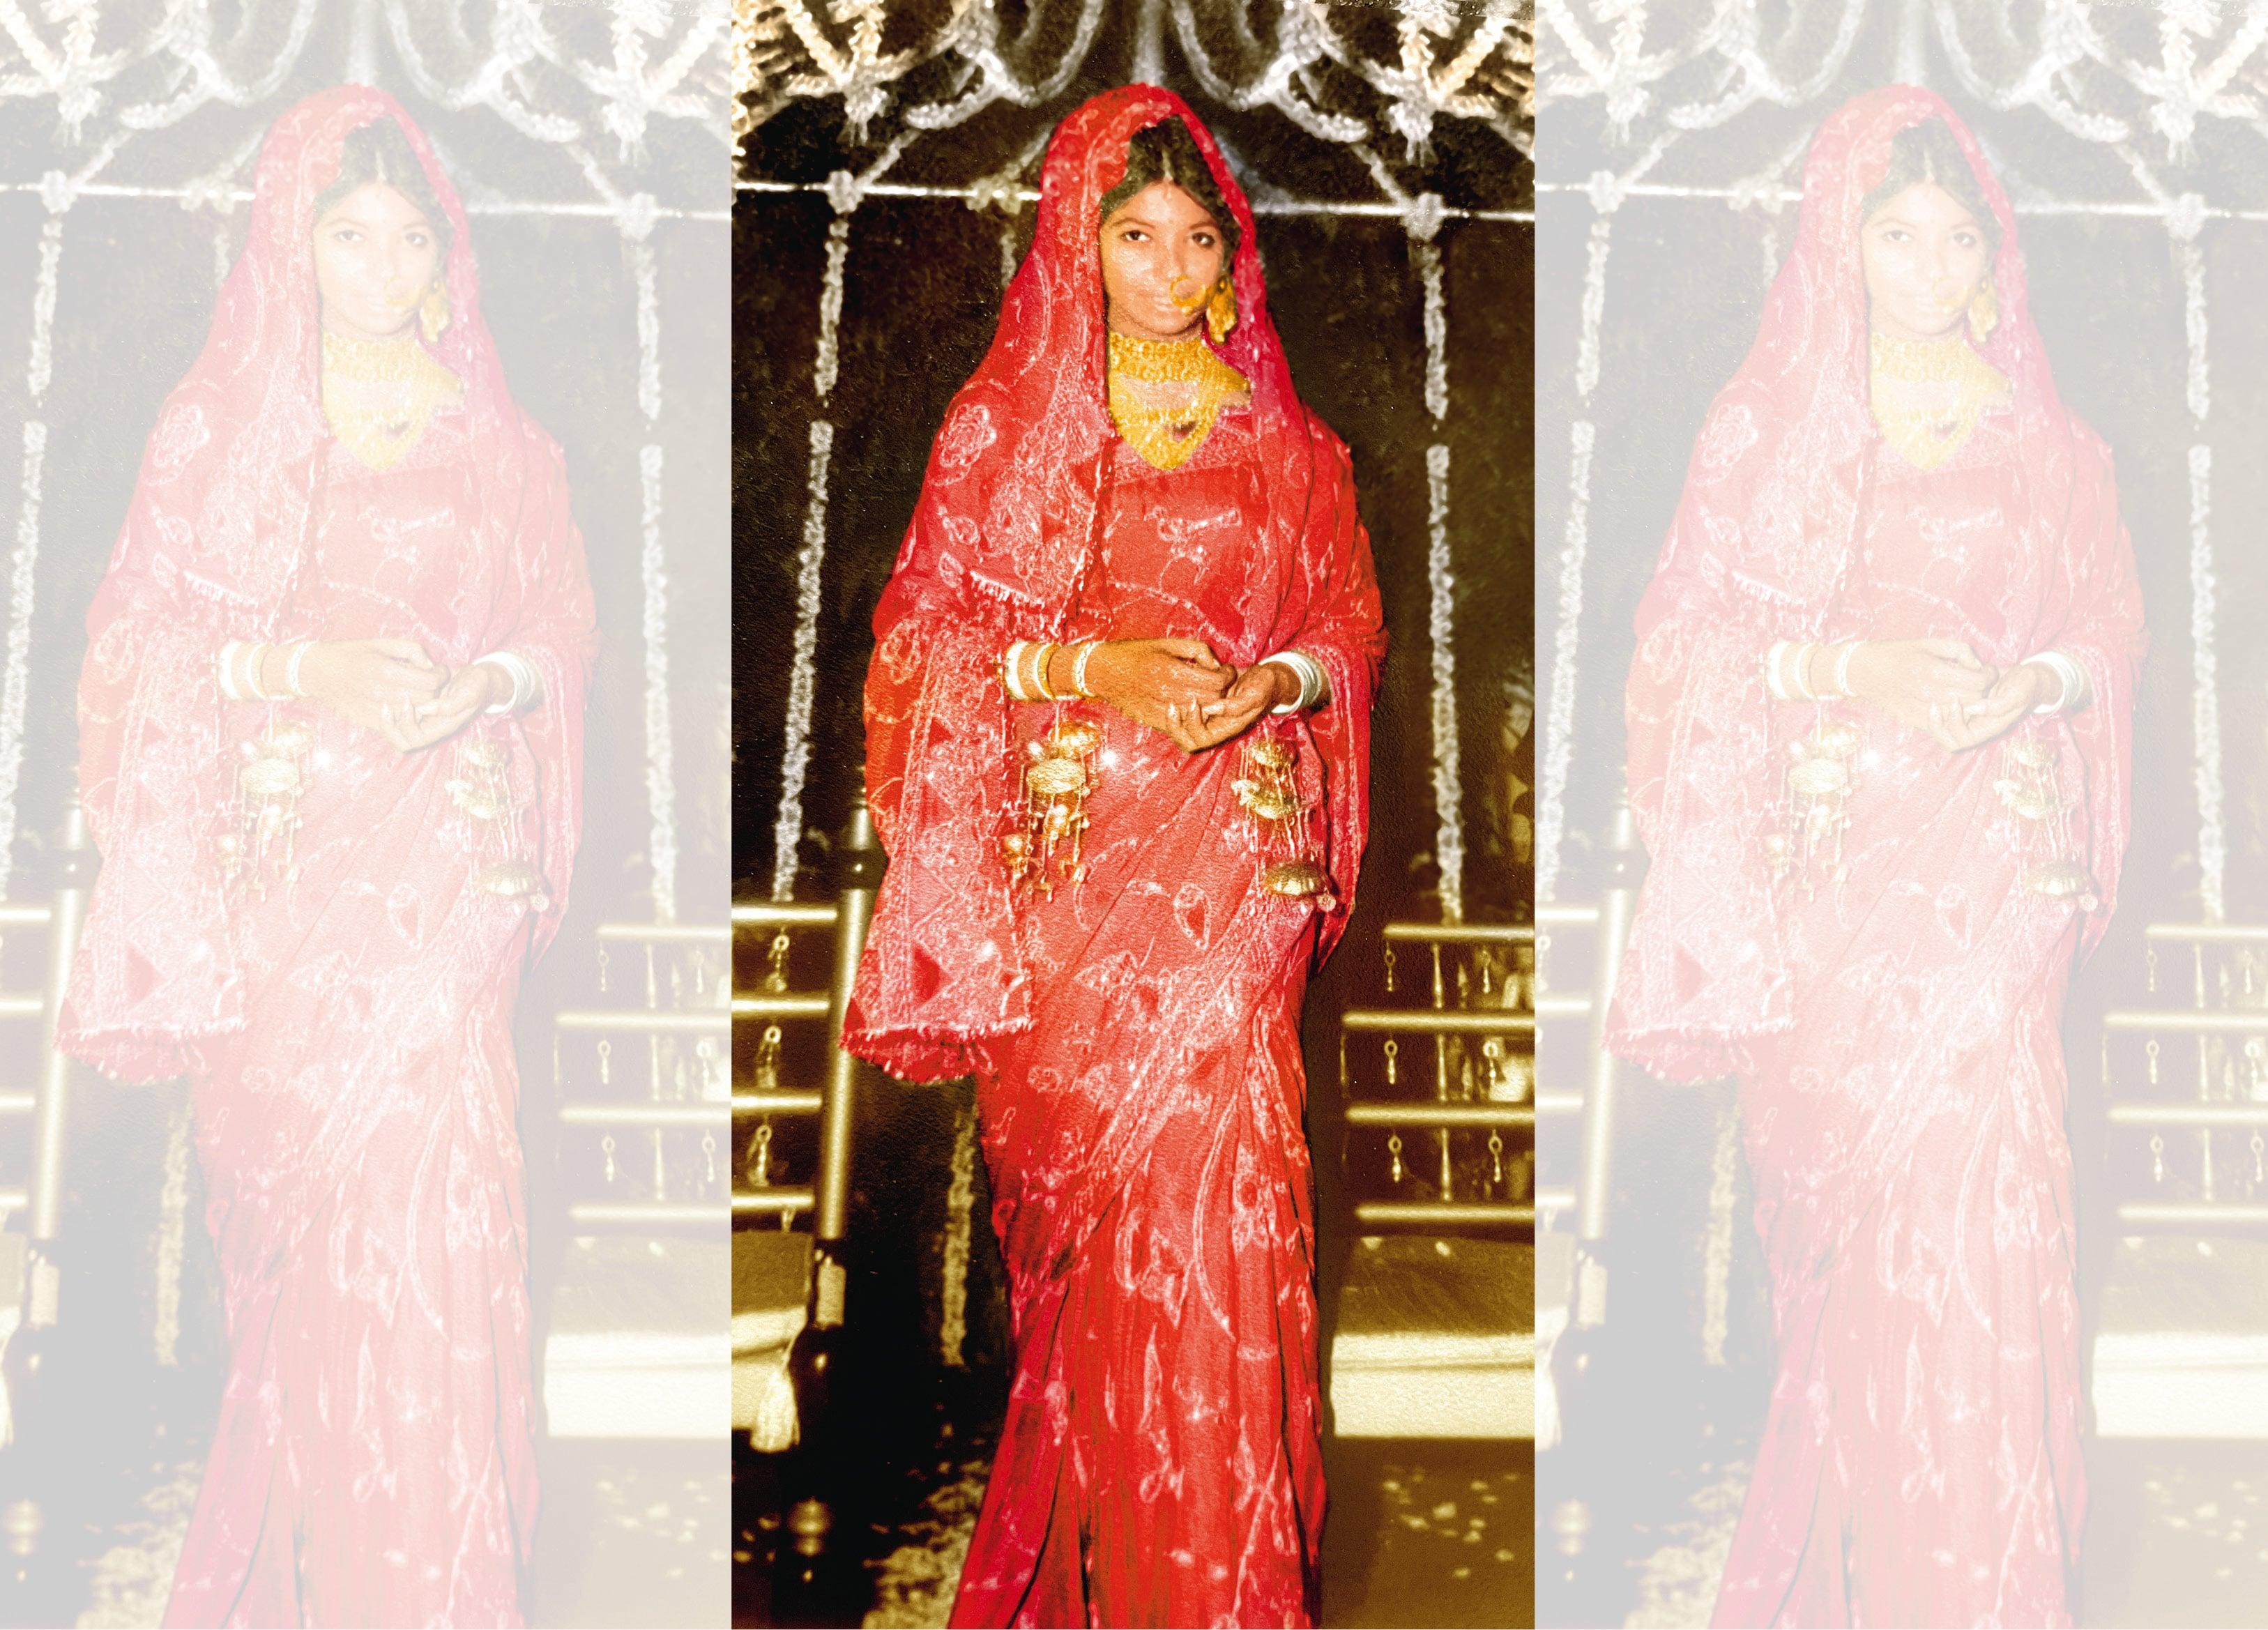 Ritu in her bridal attire wearing bandhani on silk